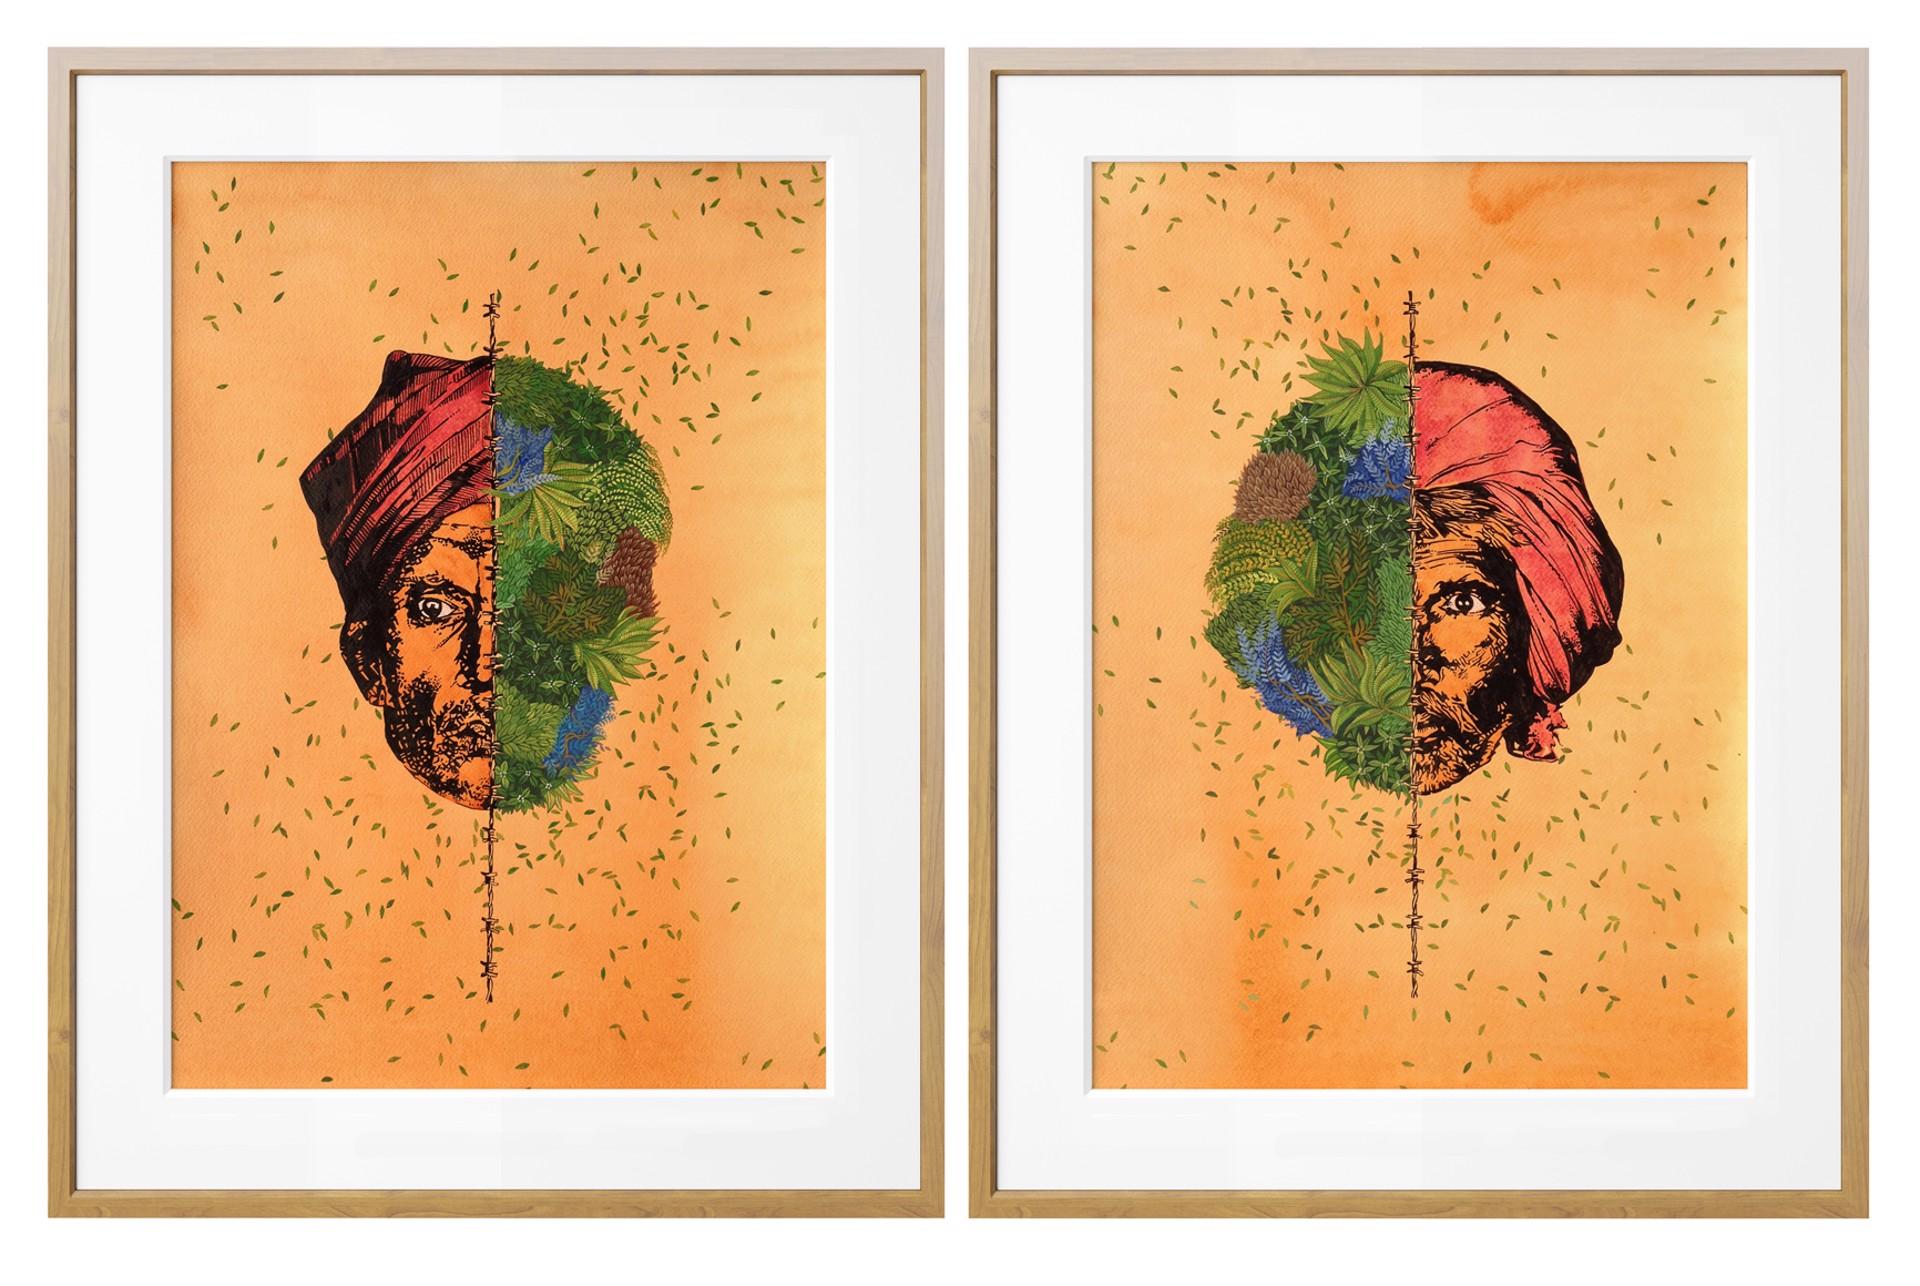 Homelessness by Binay Sinha